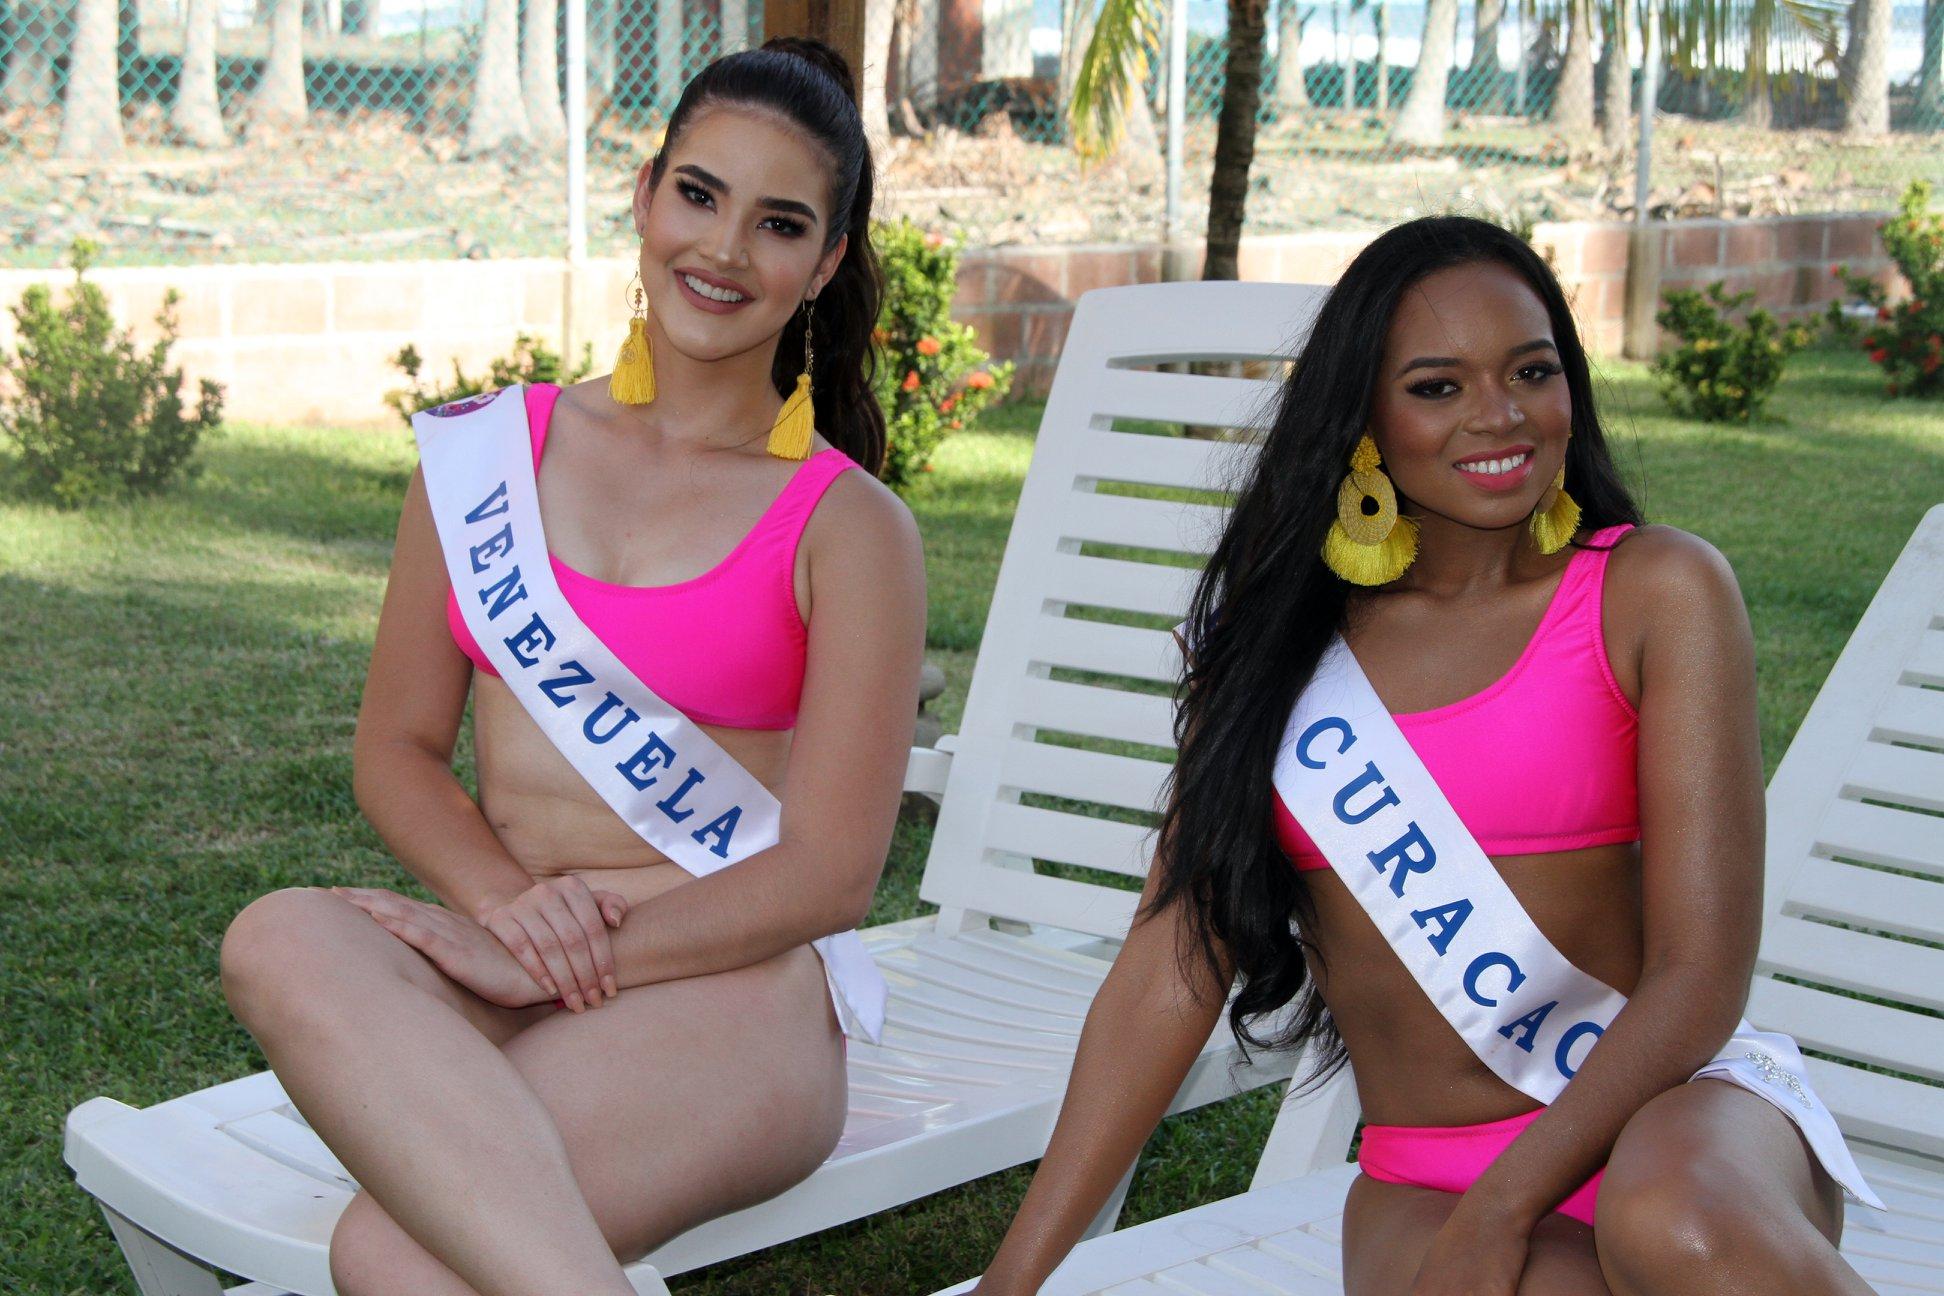 daniela di venere, top 12 de miss teen mundial 2019. - Página 5 60793310